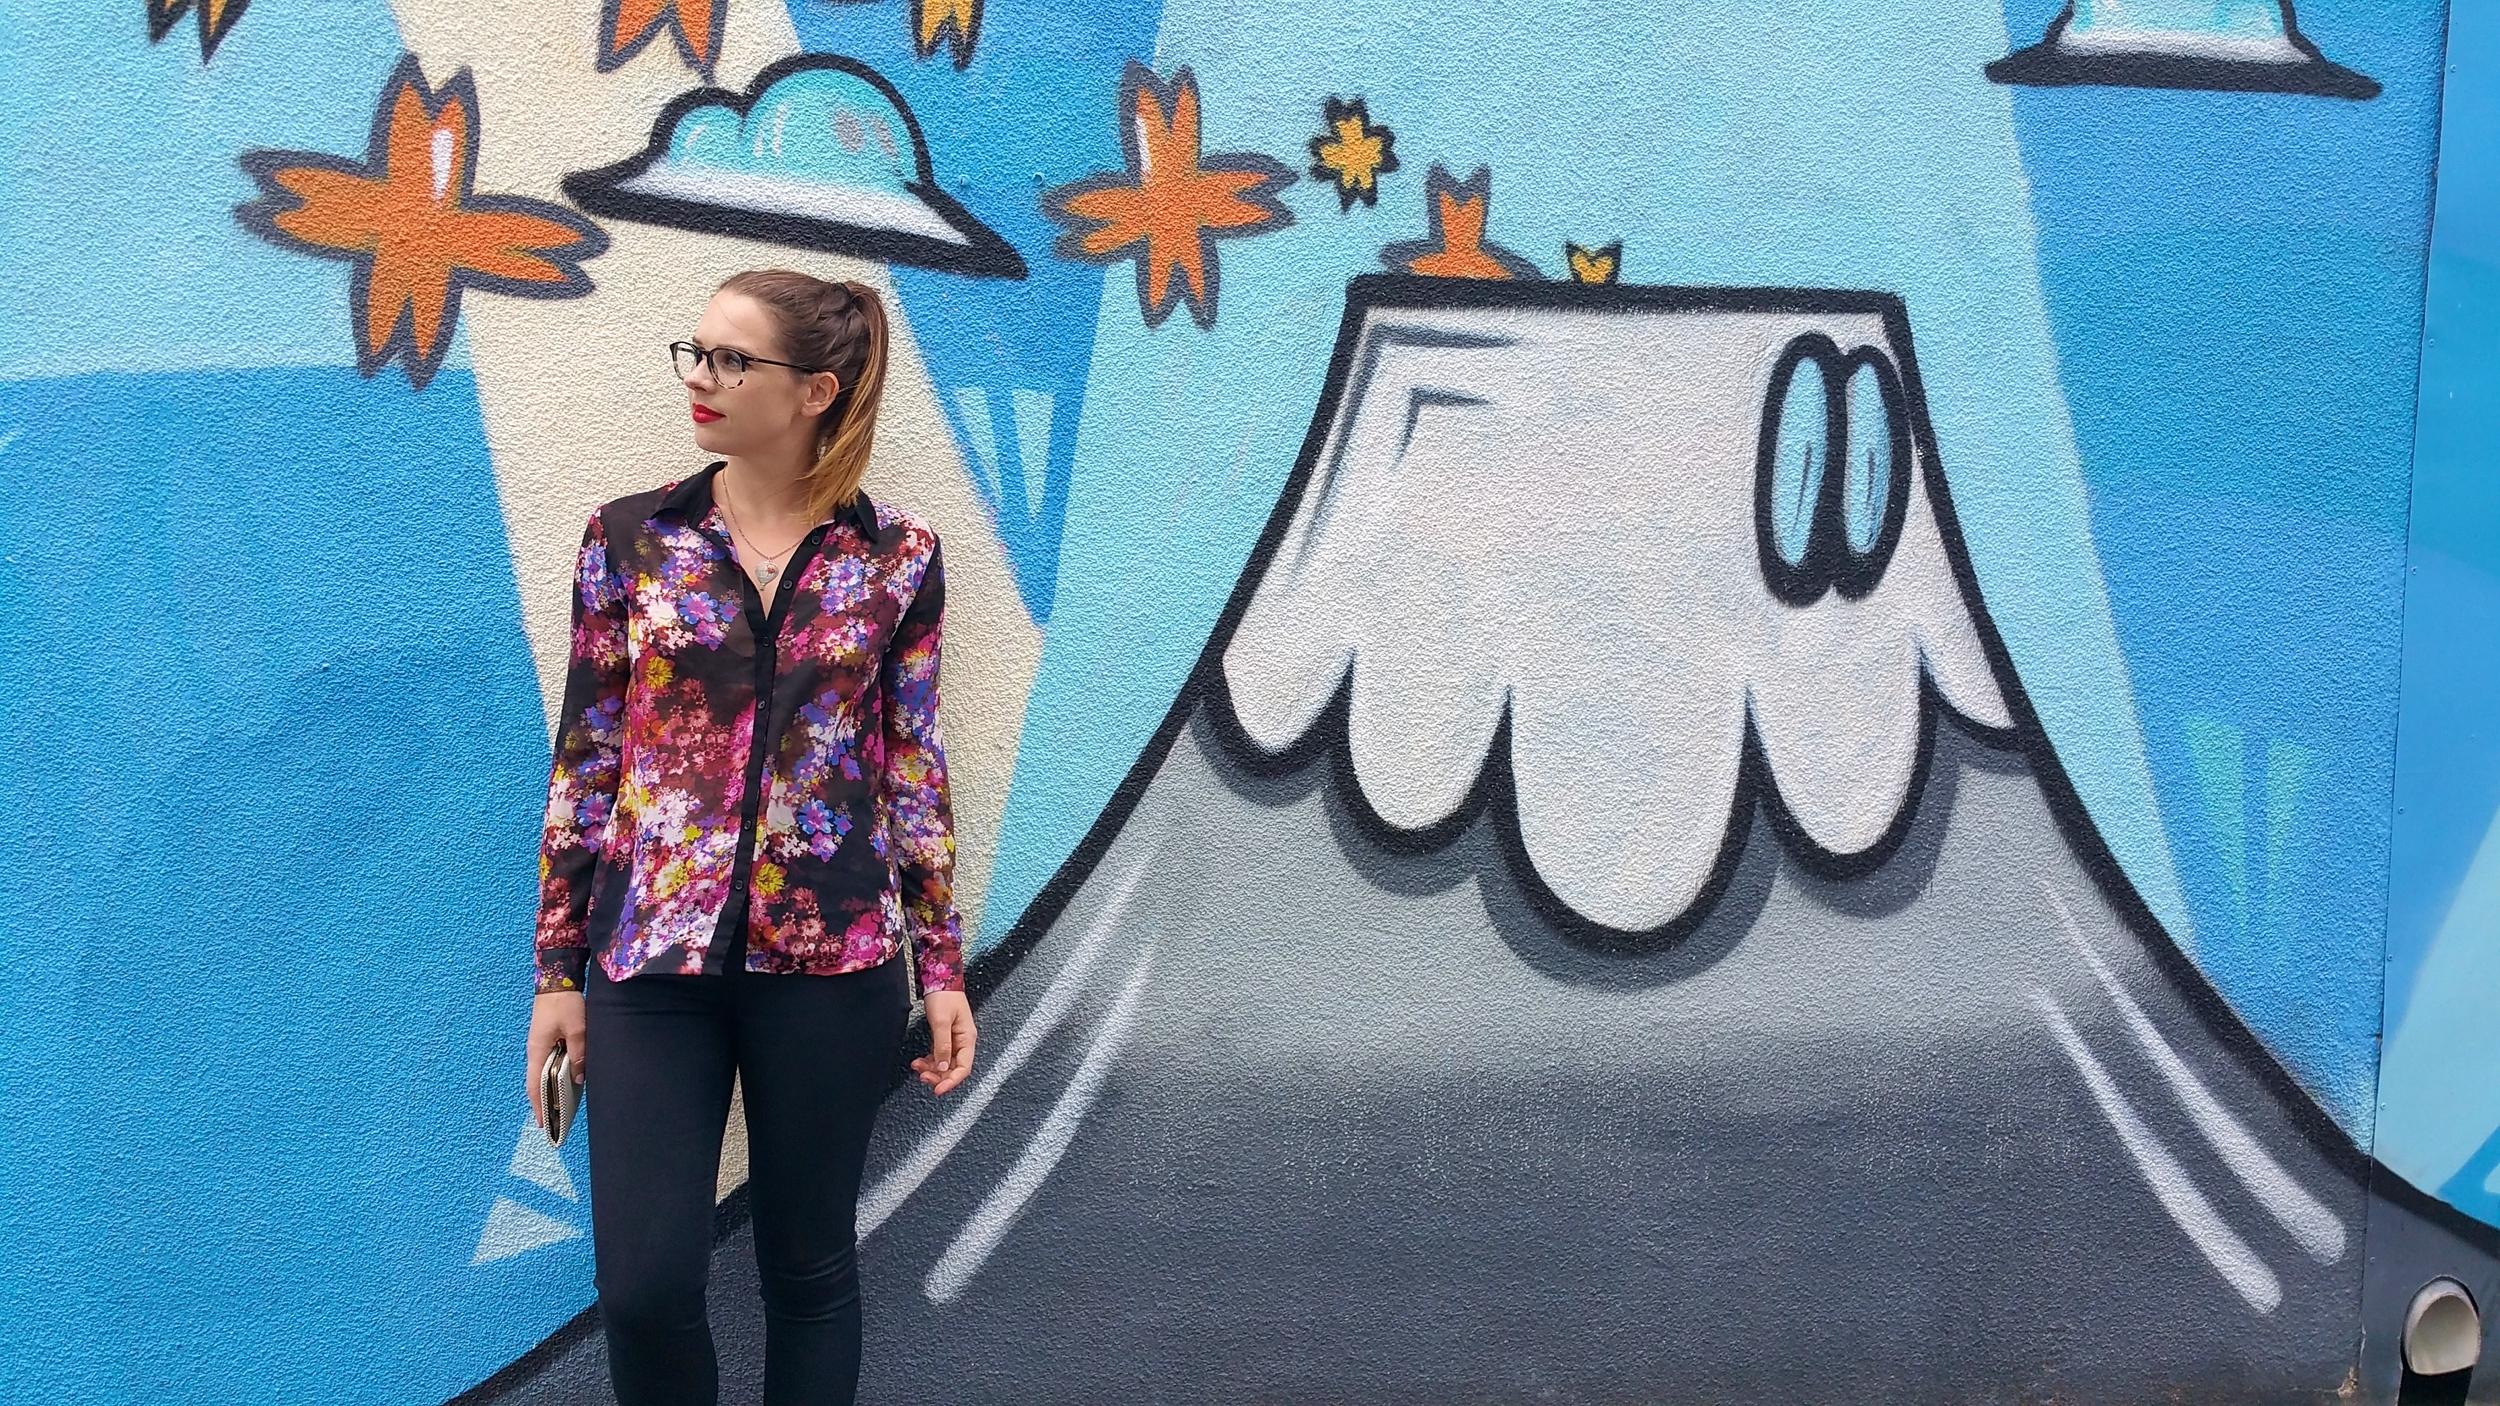 graffiti-melbounre-sportsgirl-floral-blouse